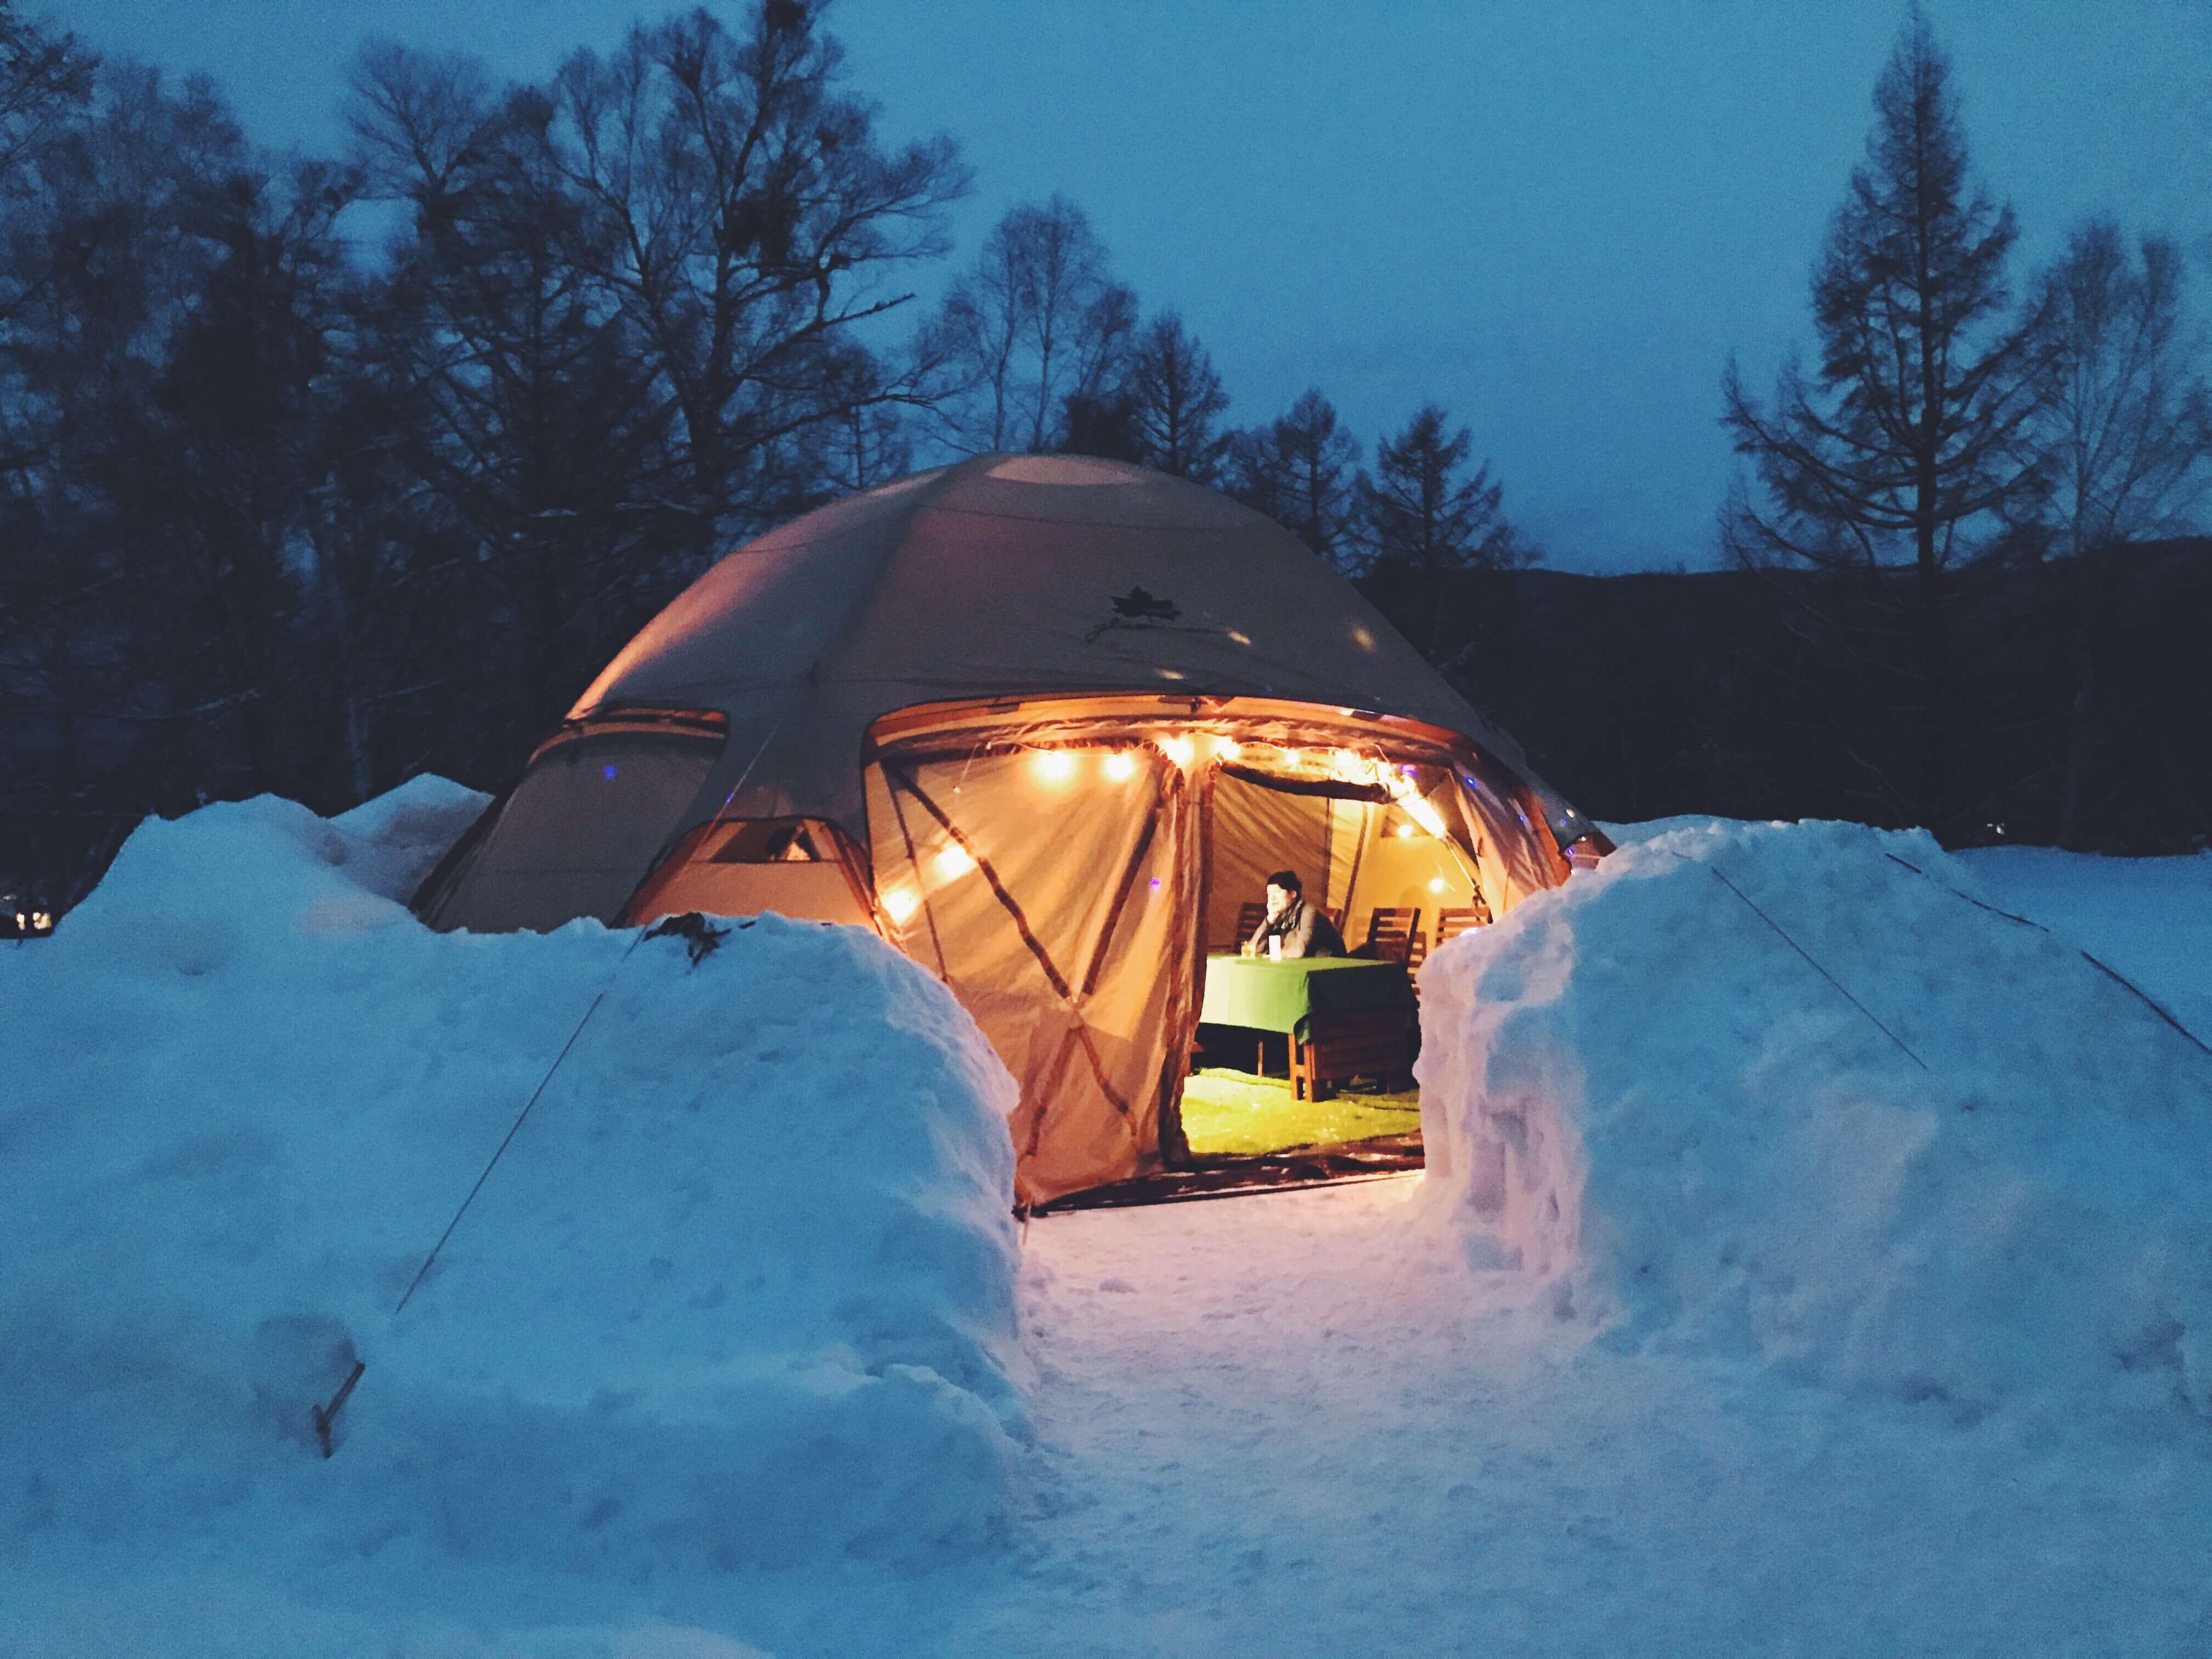 在信州開設週末限定的秘密小酒館! 享受帳篷「乗鞍(のりくら)冰雪EV小吃」 在長野、